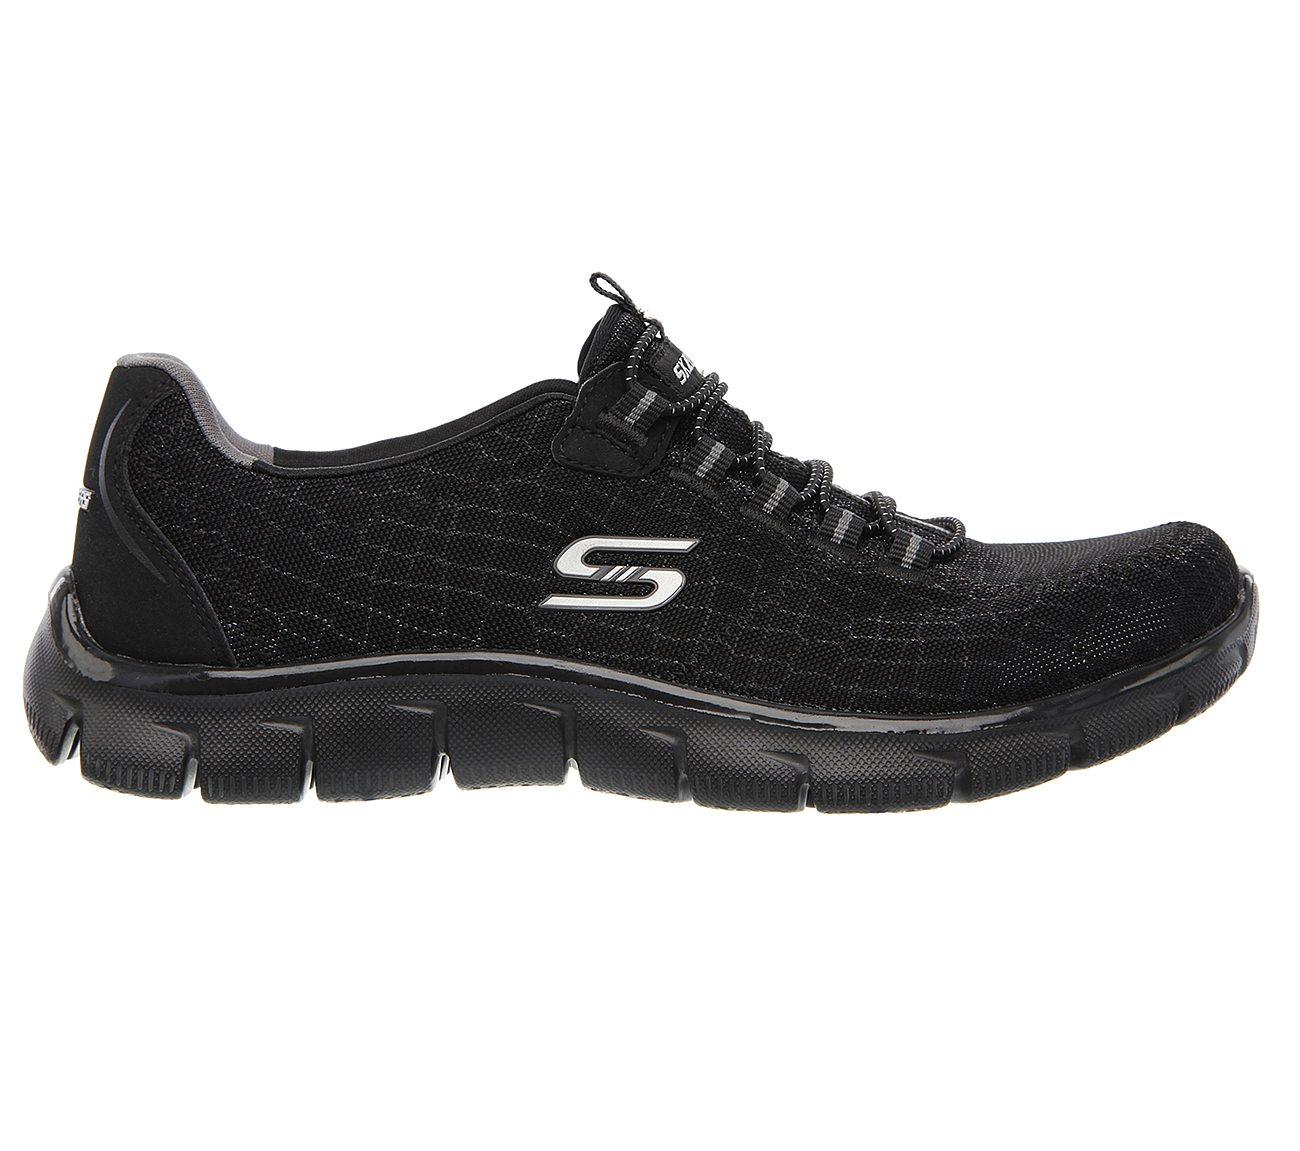 all black skechers running shoes